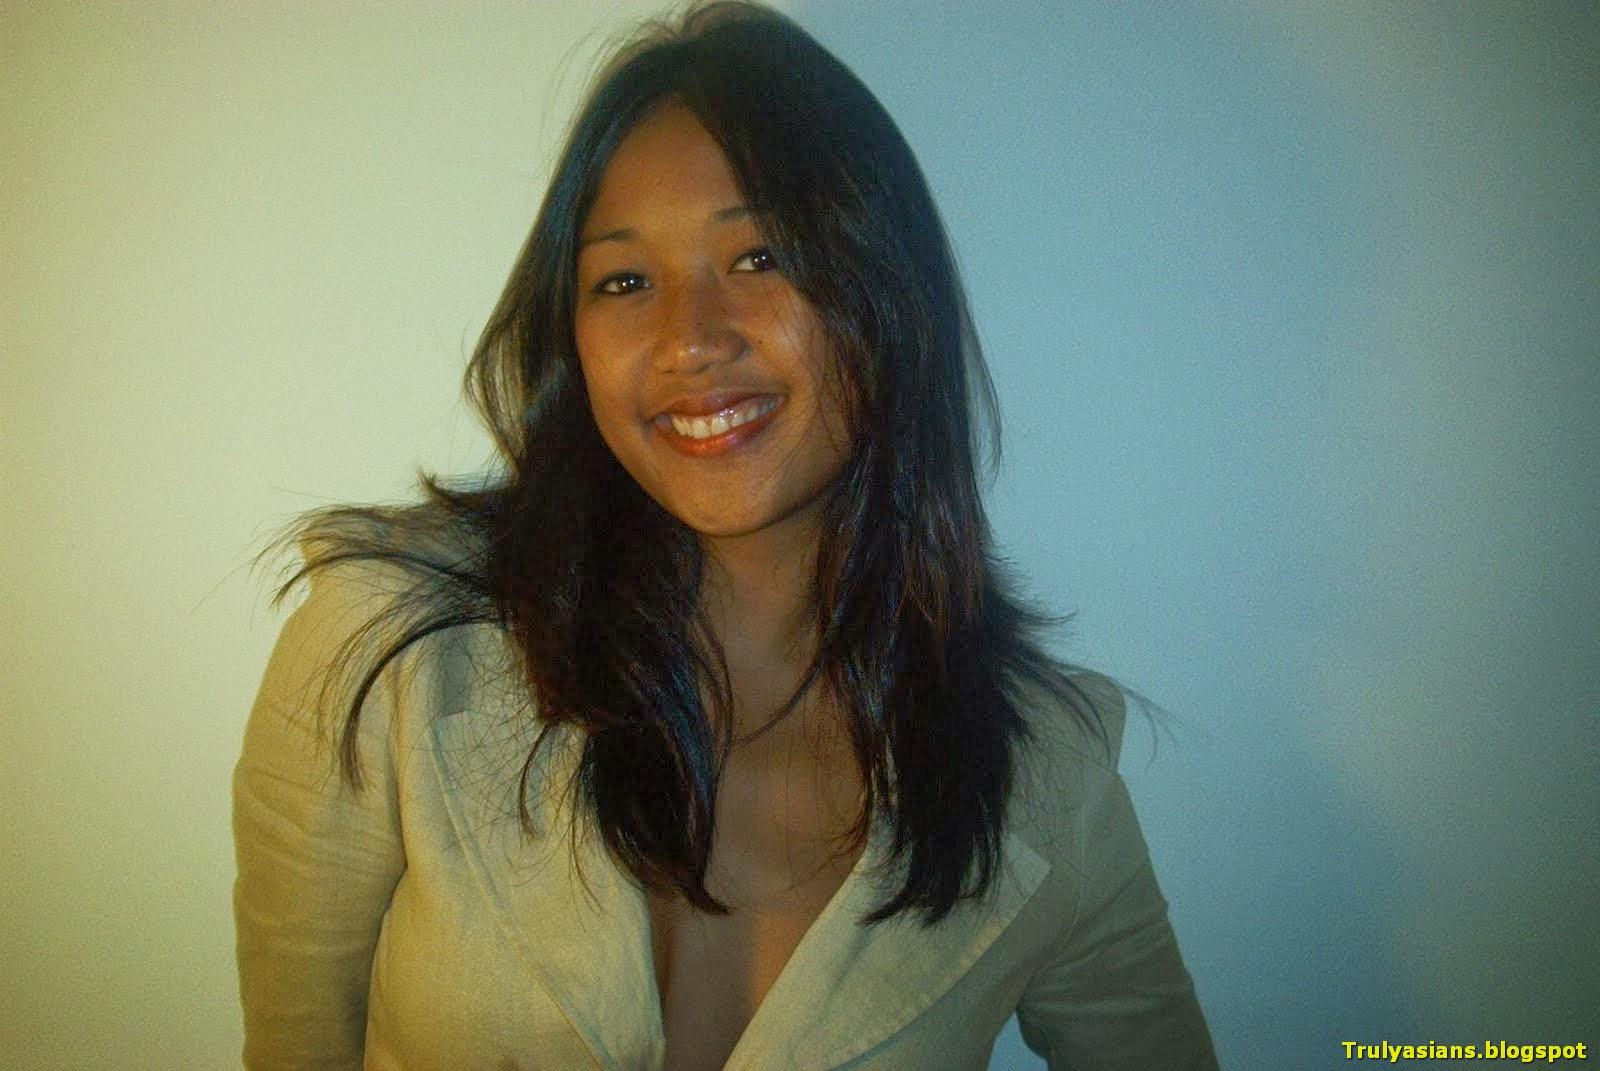 Busty Malay  Hot Girl Hd Wallpaper-3832